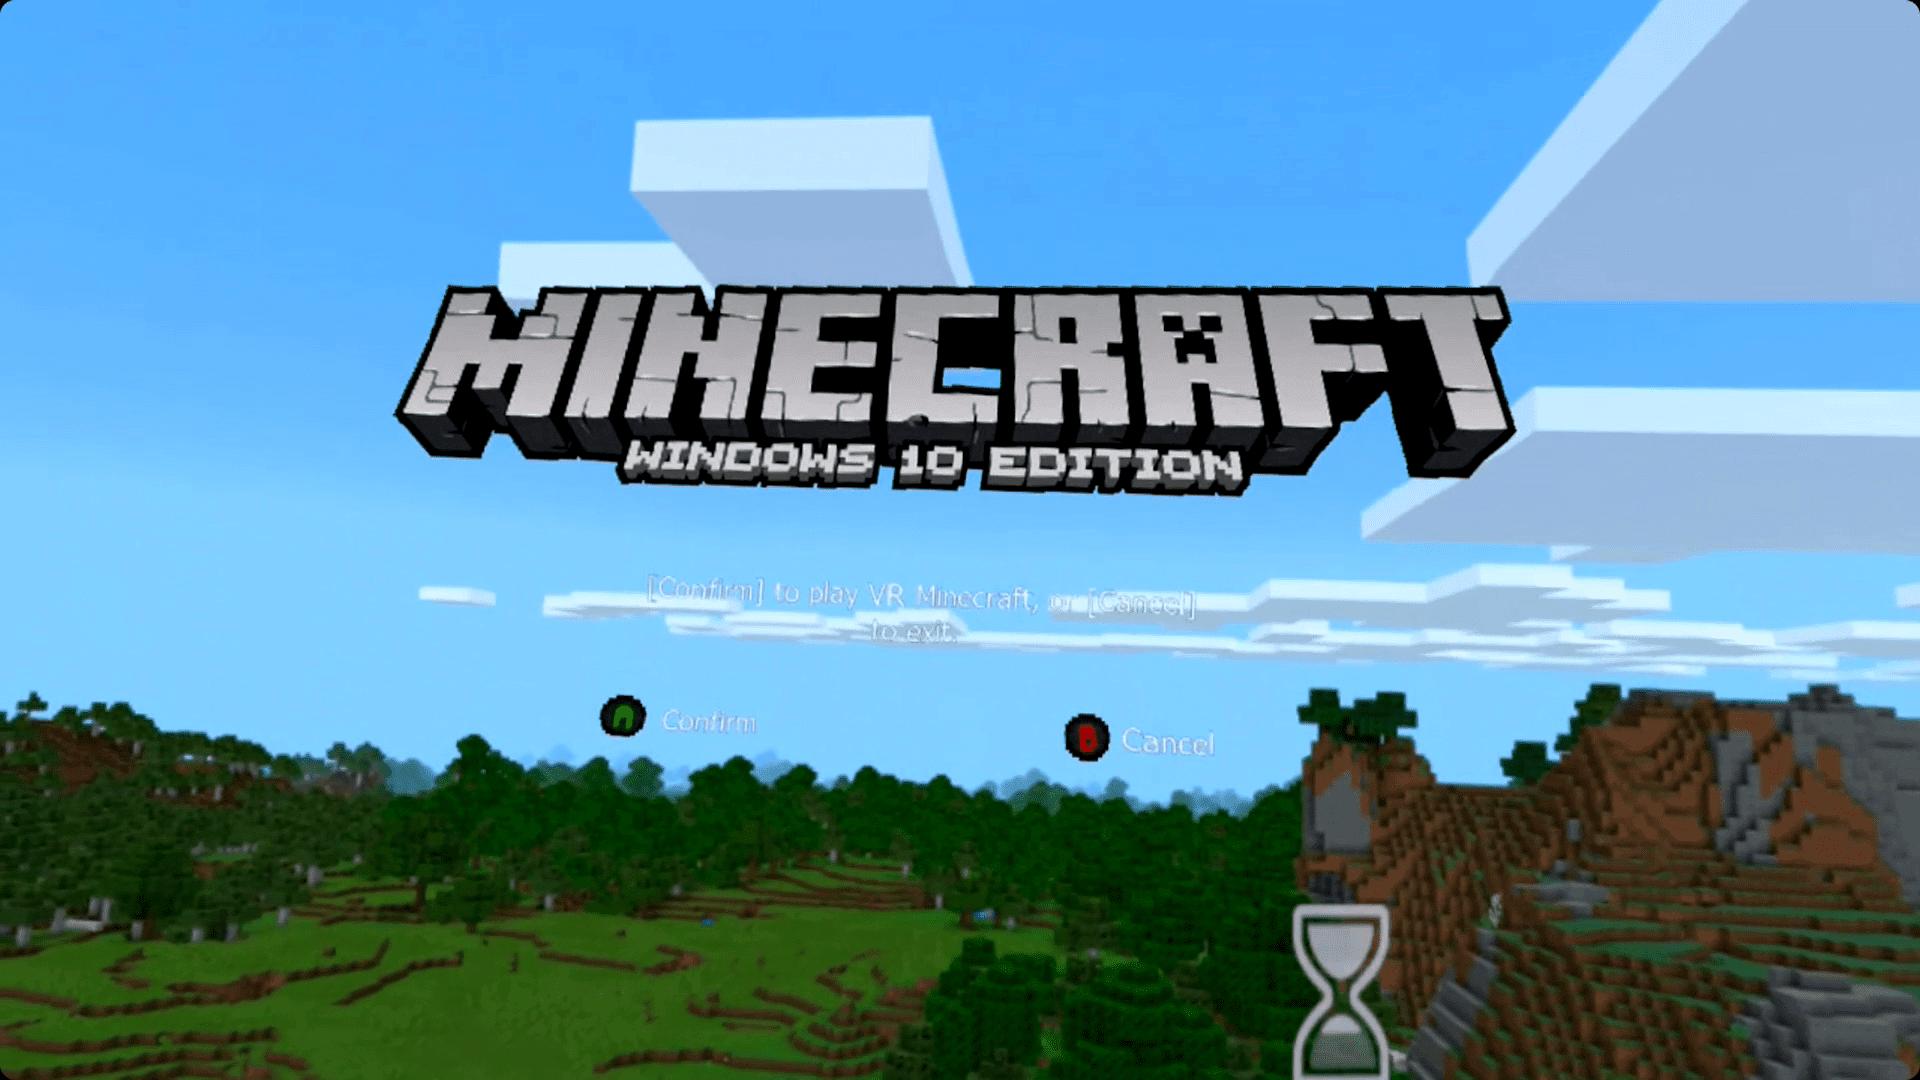 Minecraft on an Oculus Quest.